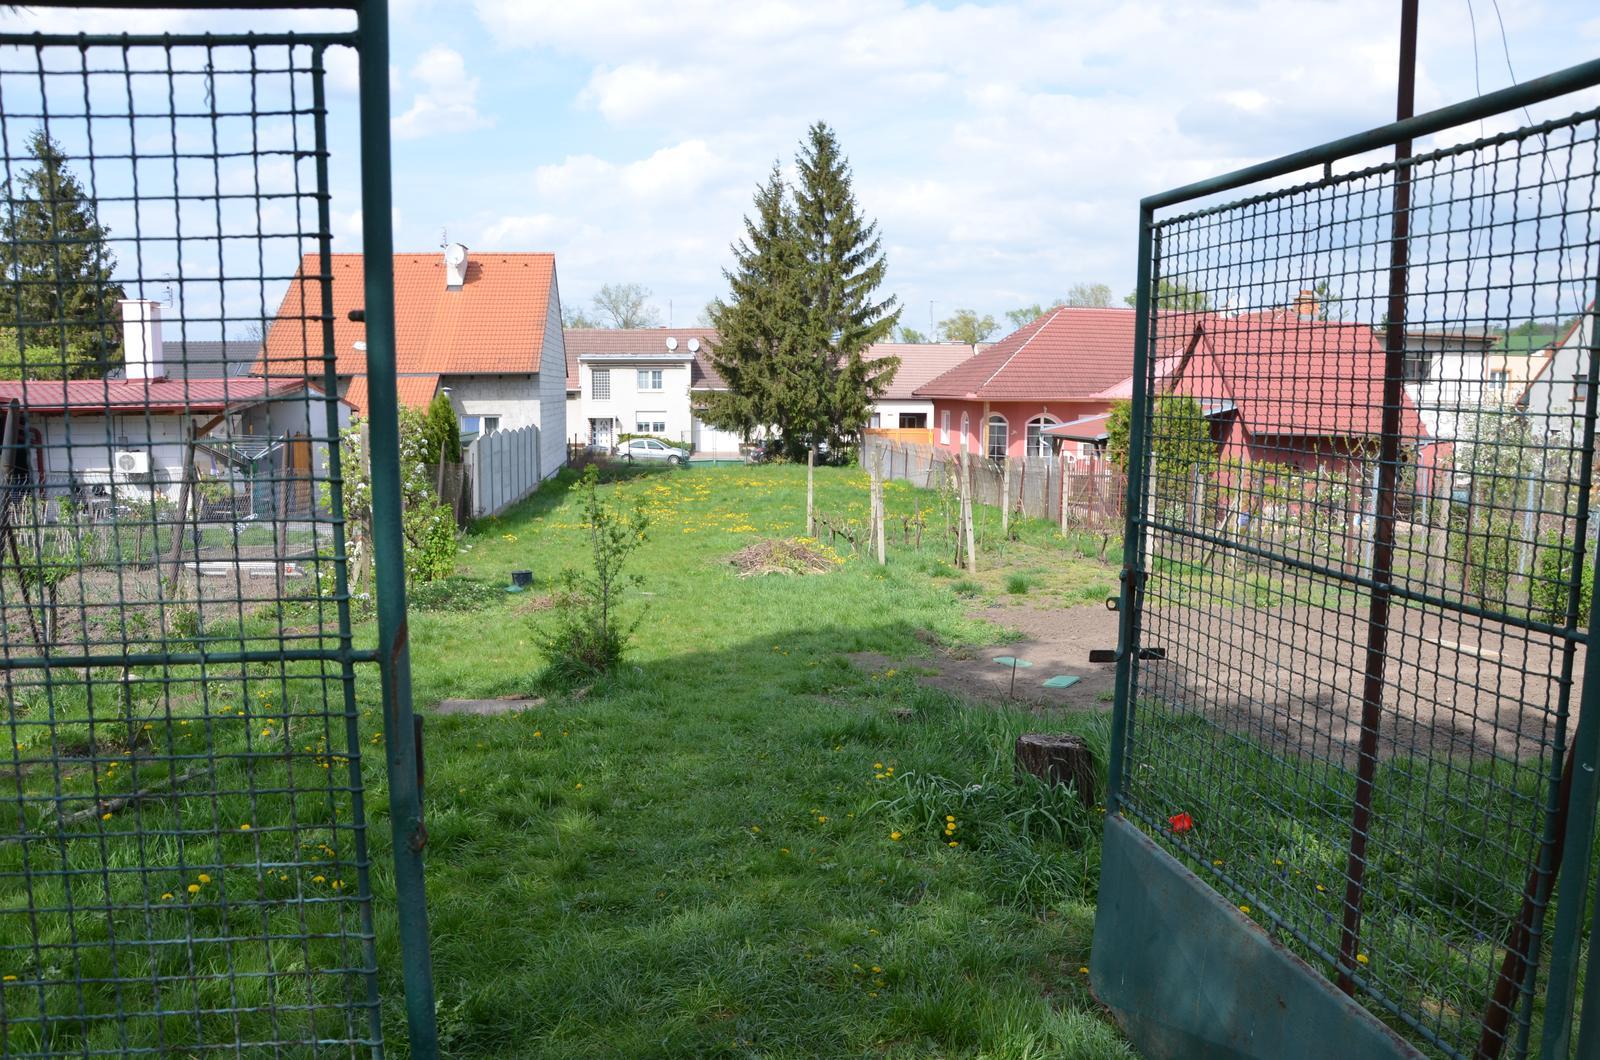 Vysněná zahrada... - duben 2015